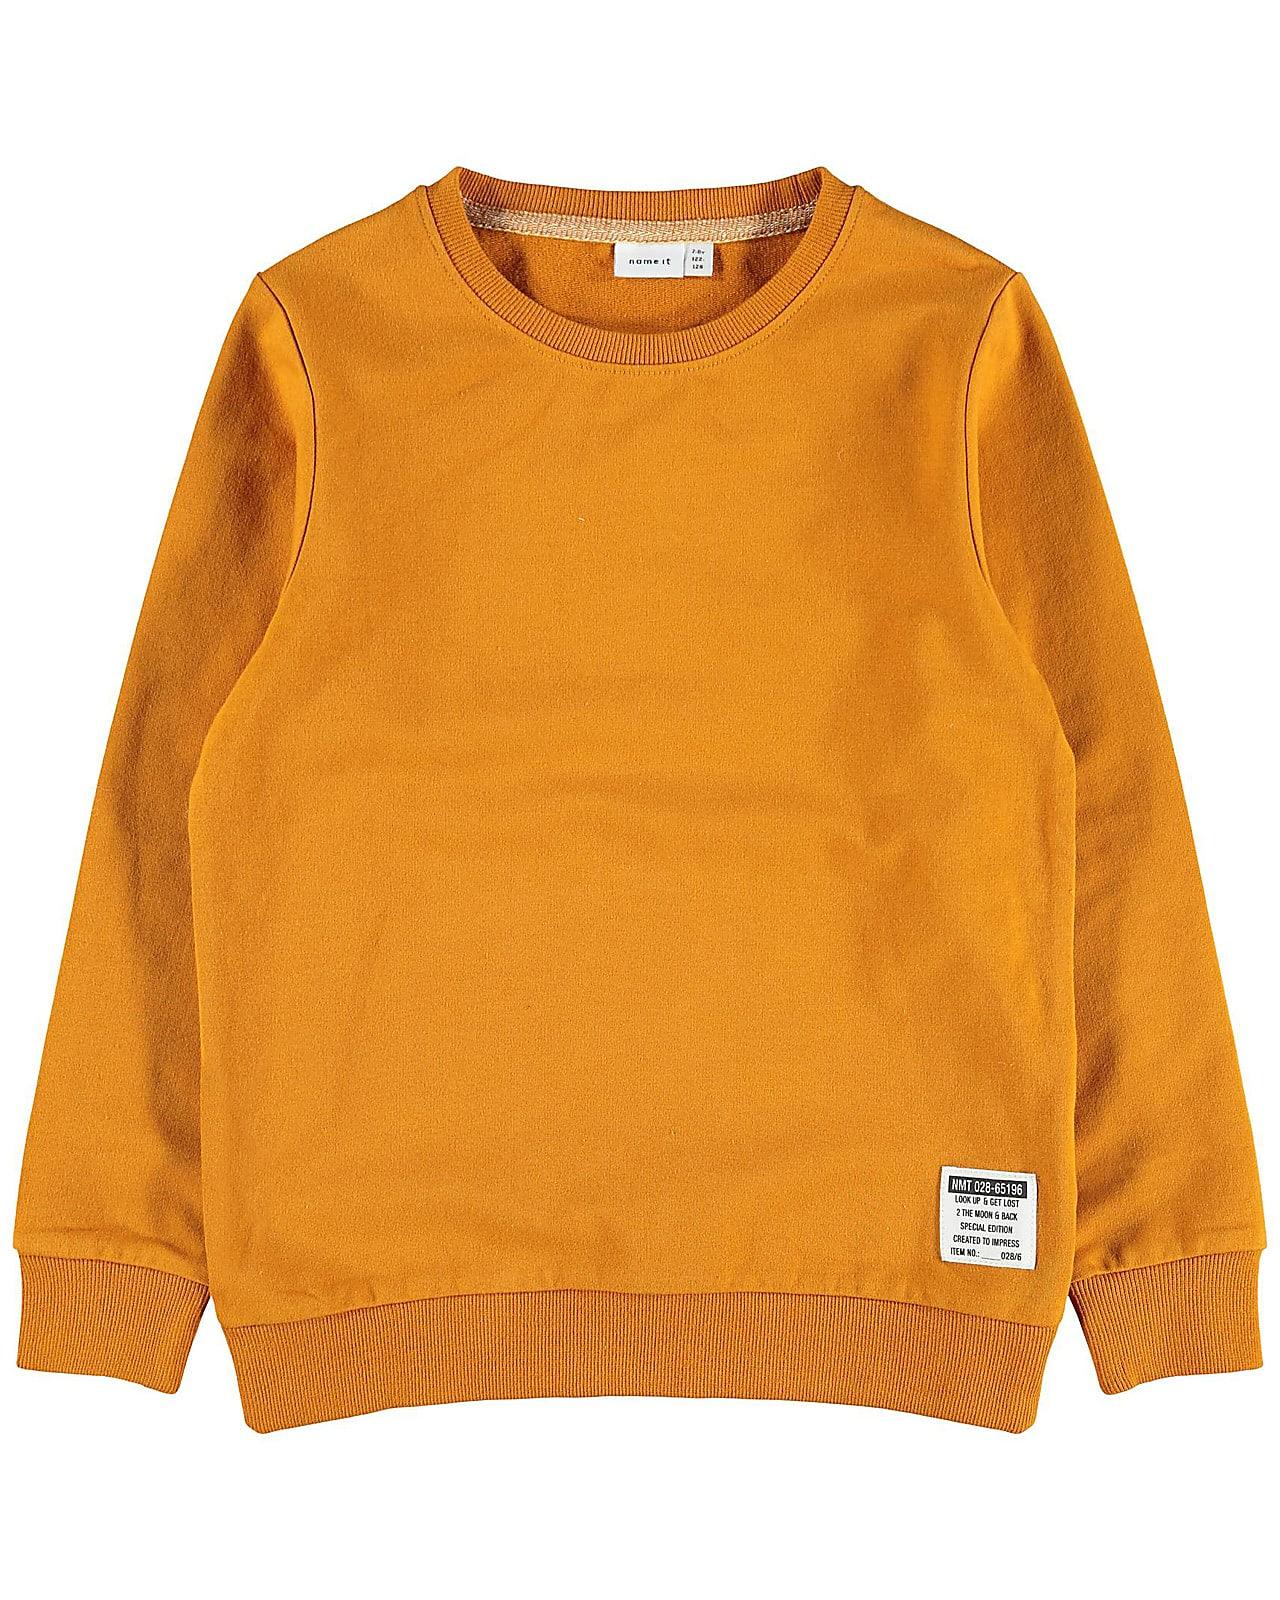 Name It sweatshirt, Honk, thaicurry